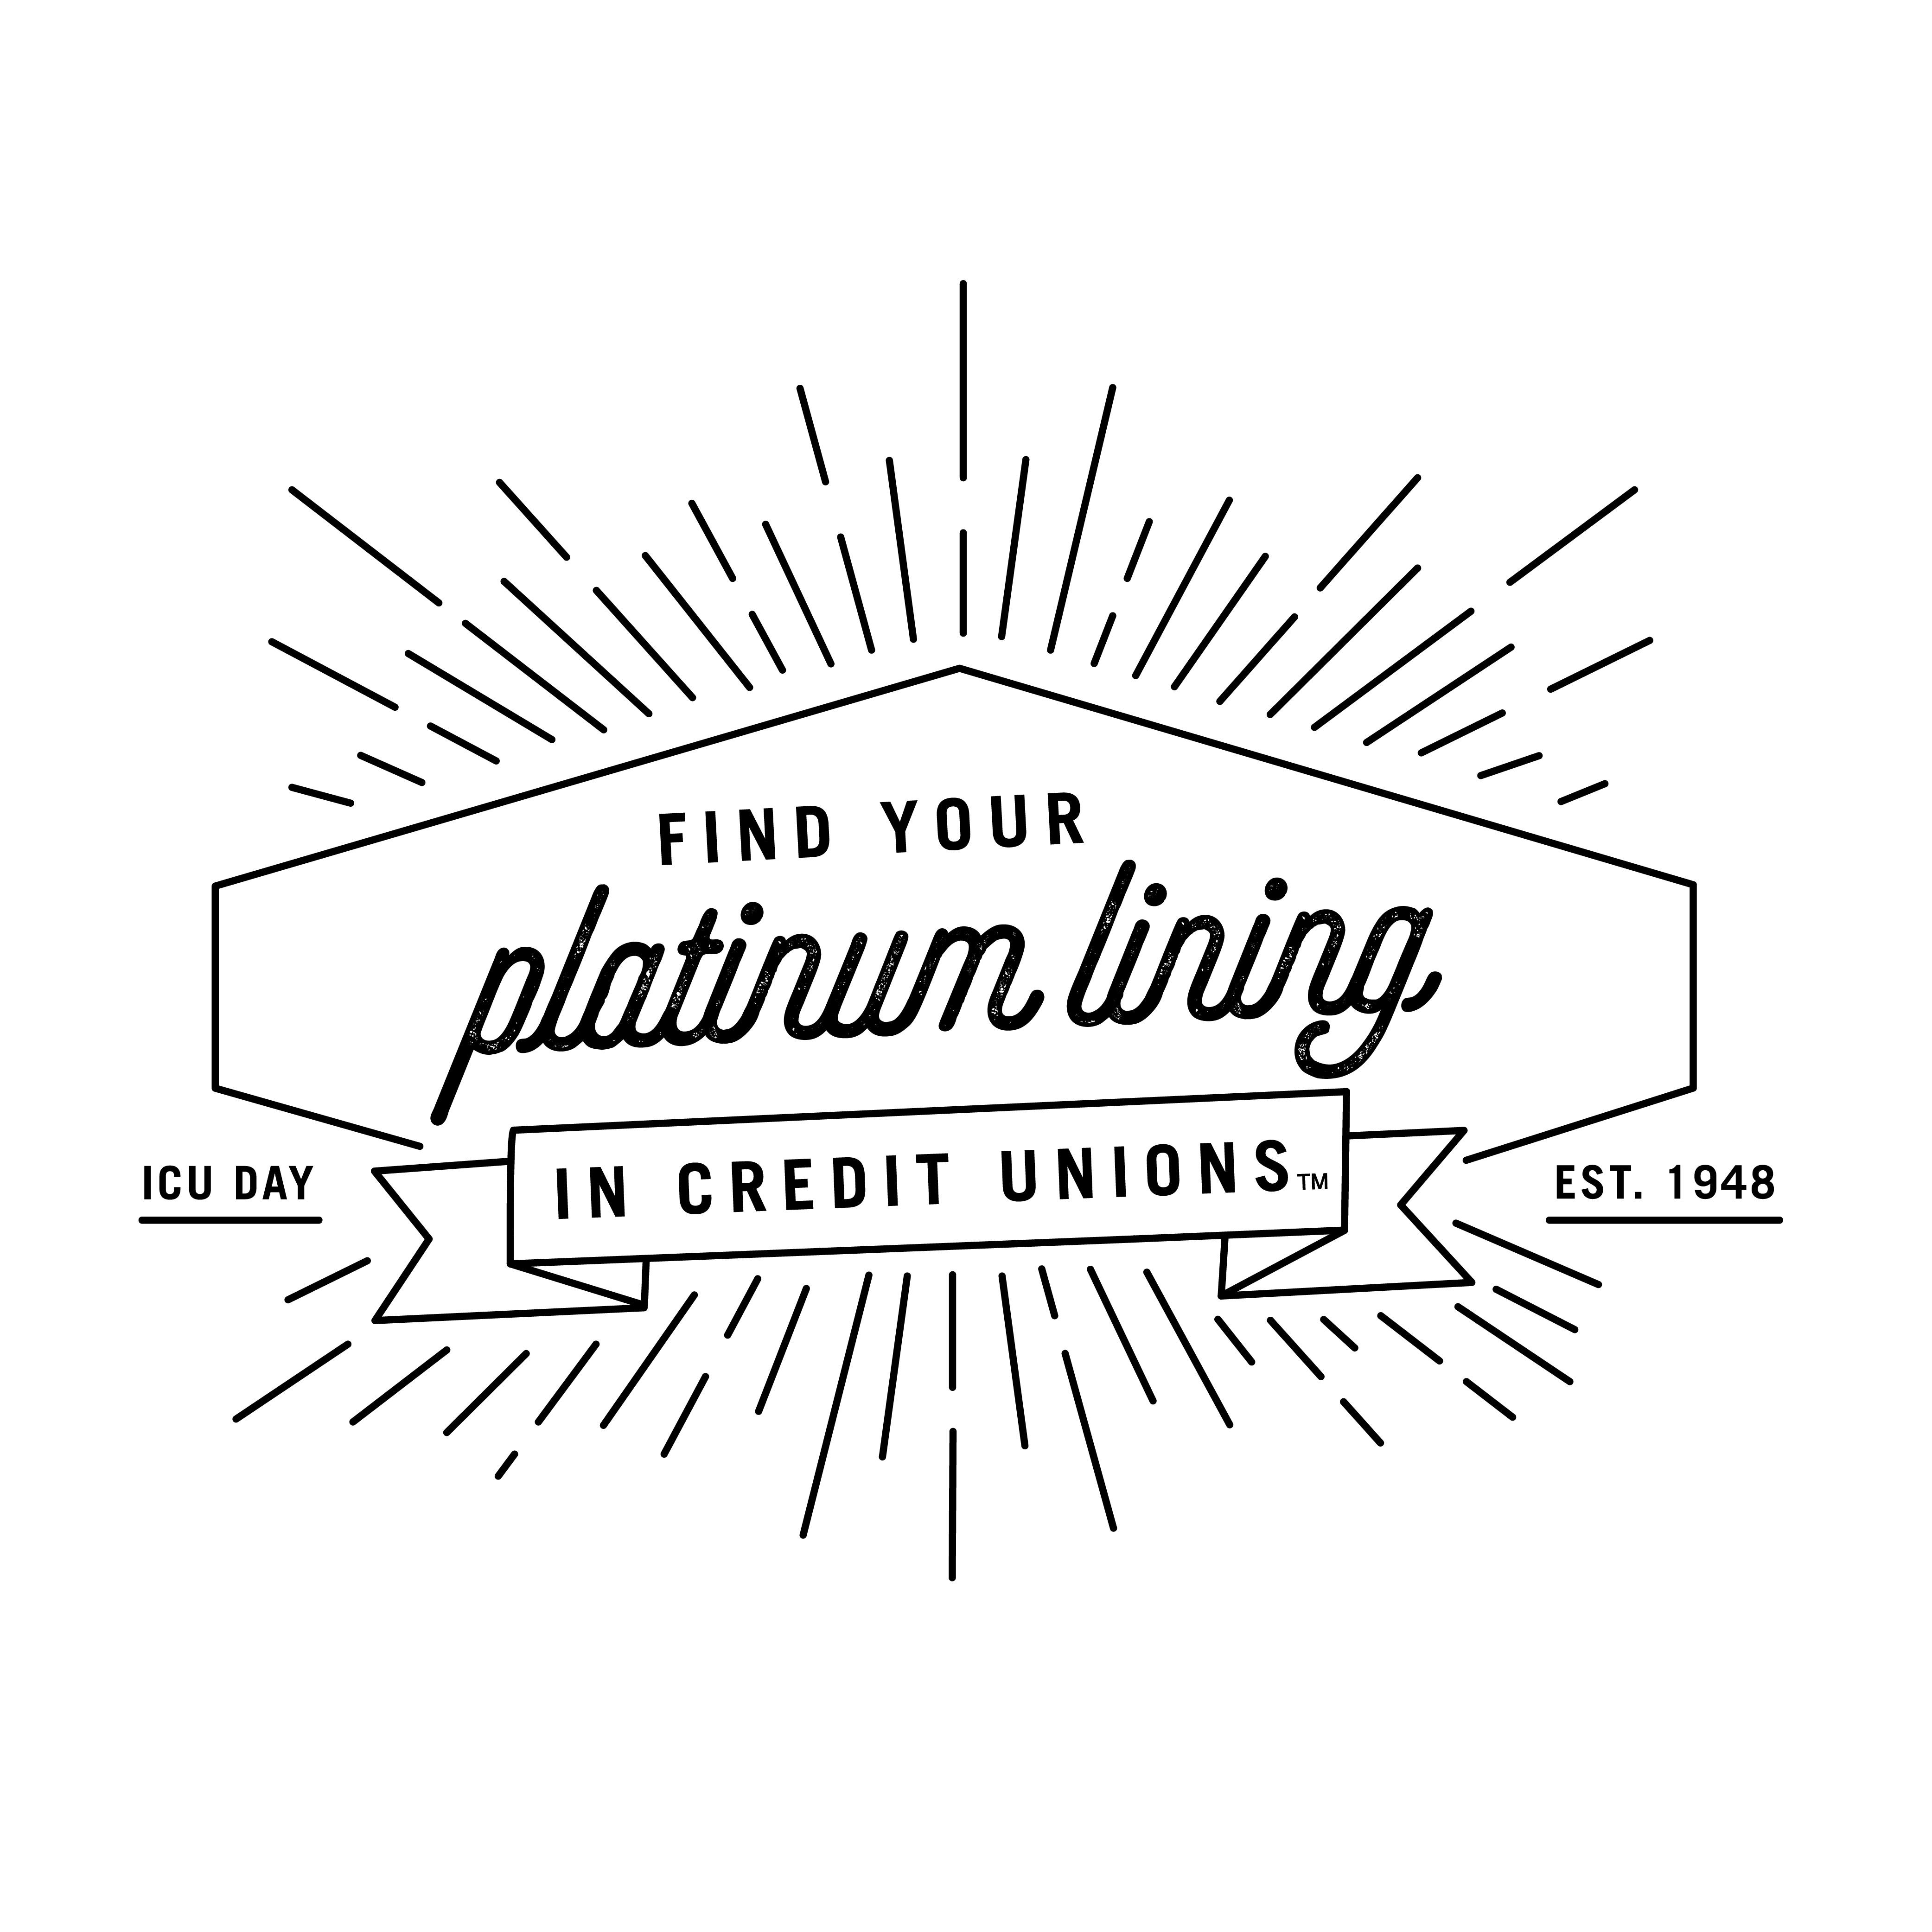 International Credit Union Icu Day World Council Of Credit Unions